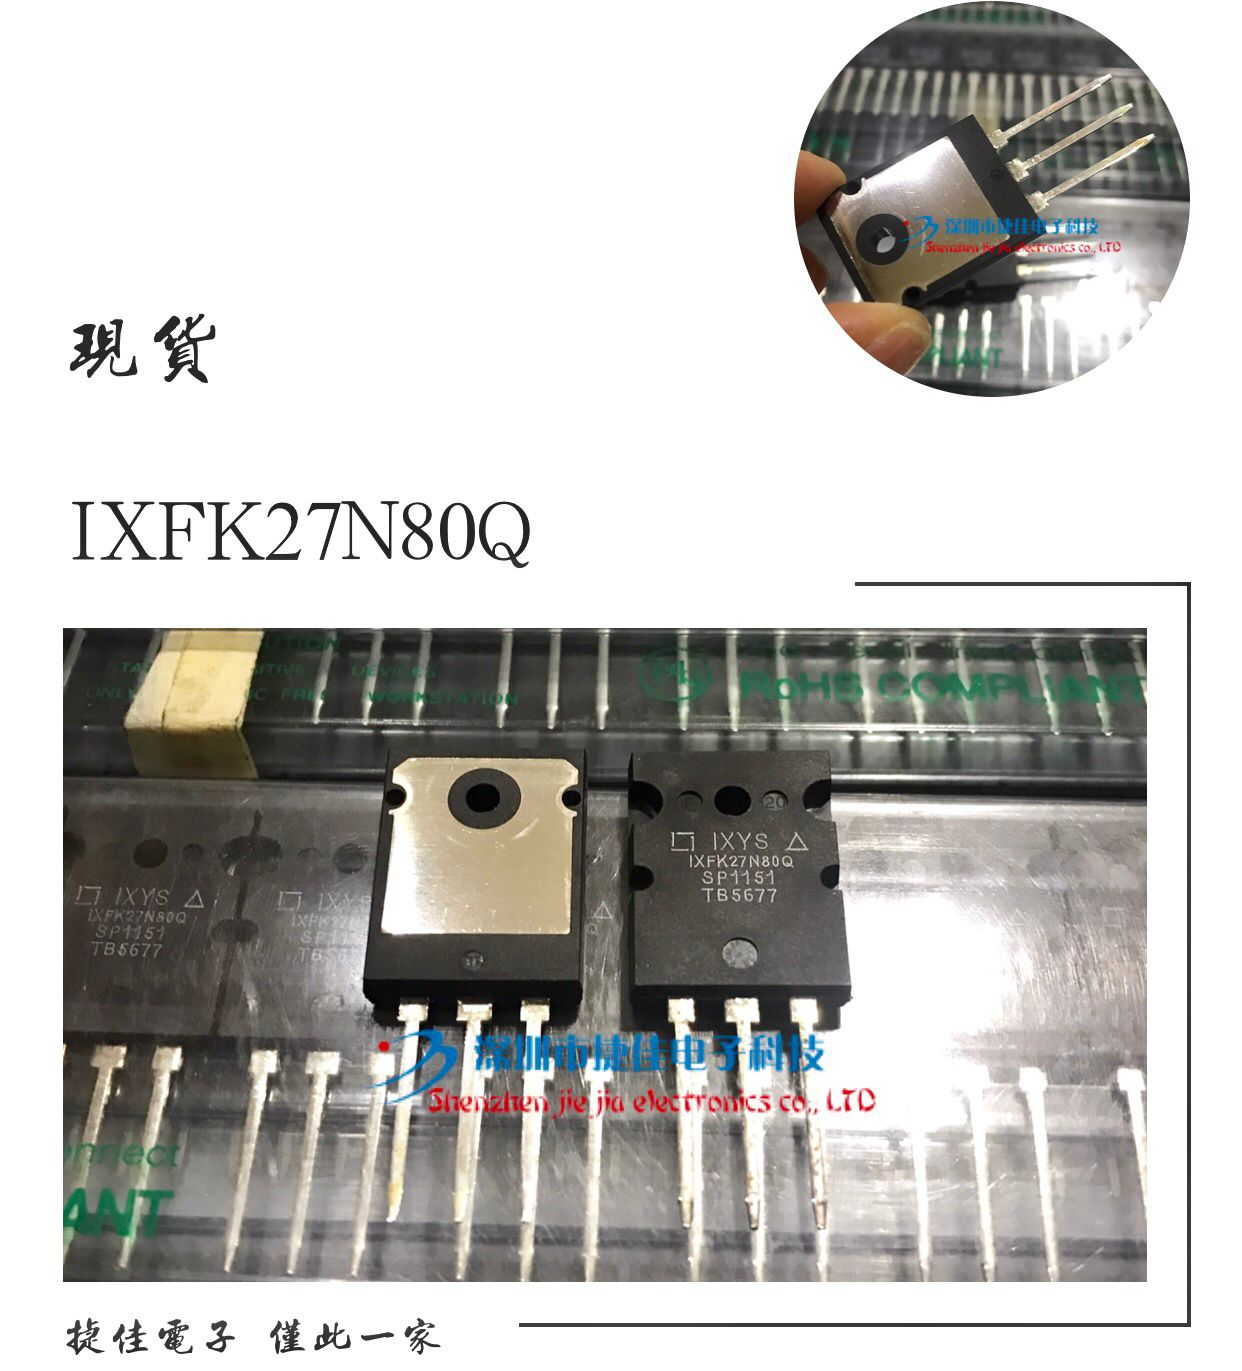 IXFK27N80Q IXYS 27A800V